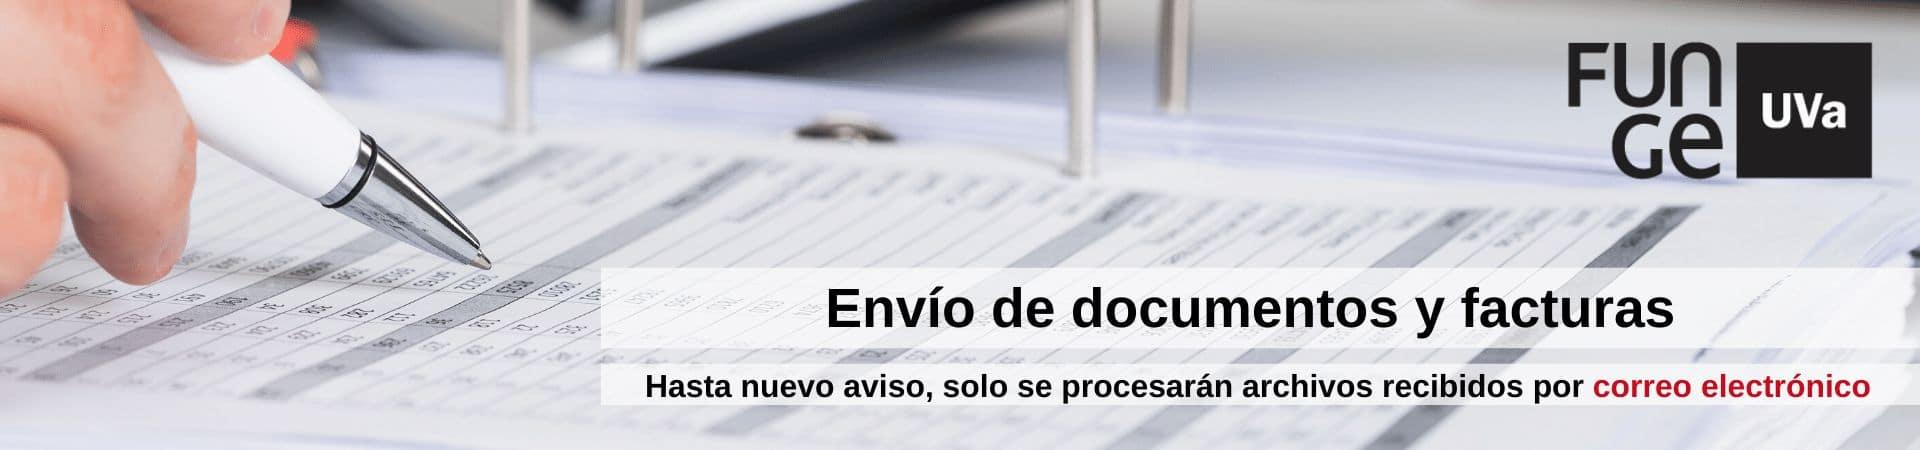 Banner documentos y facturas - Funge UVa - Covid 19